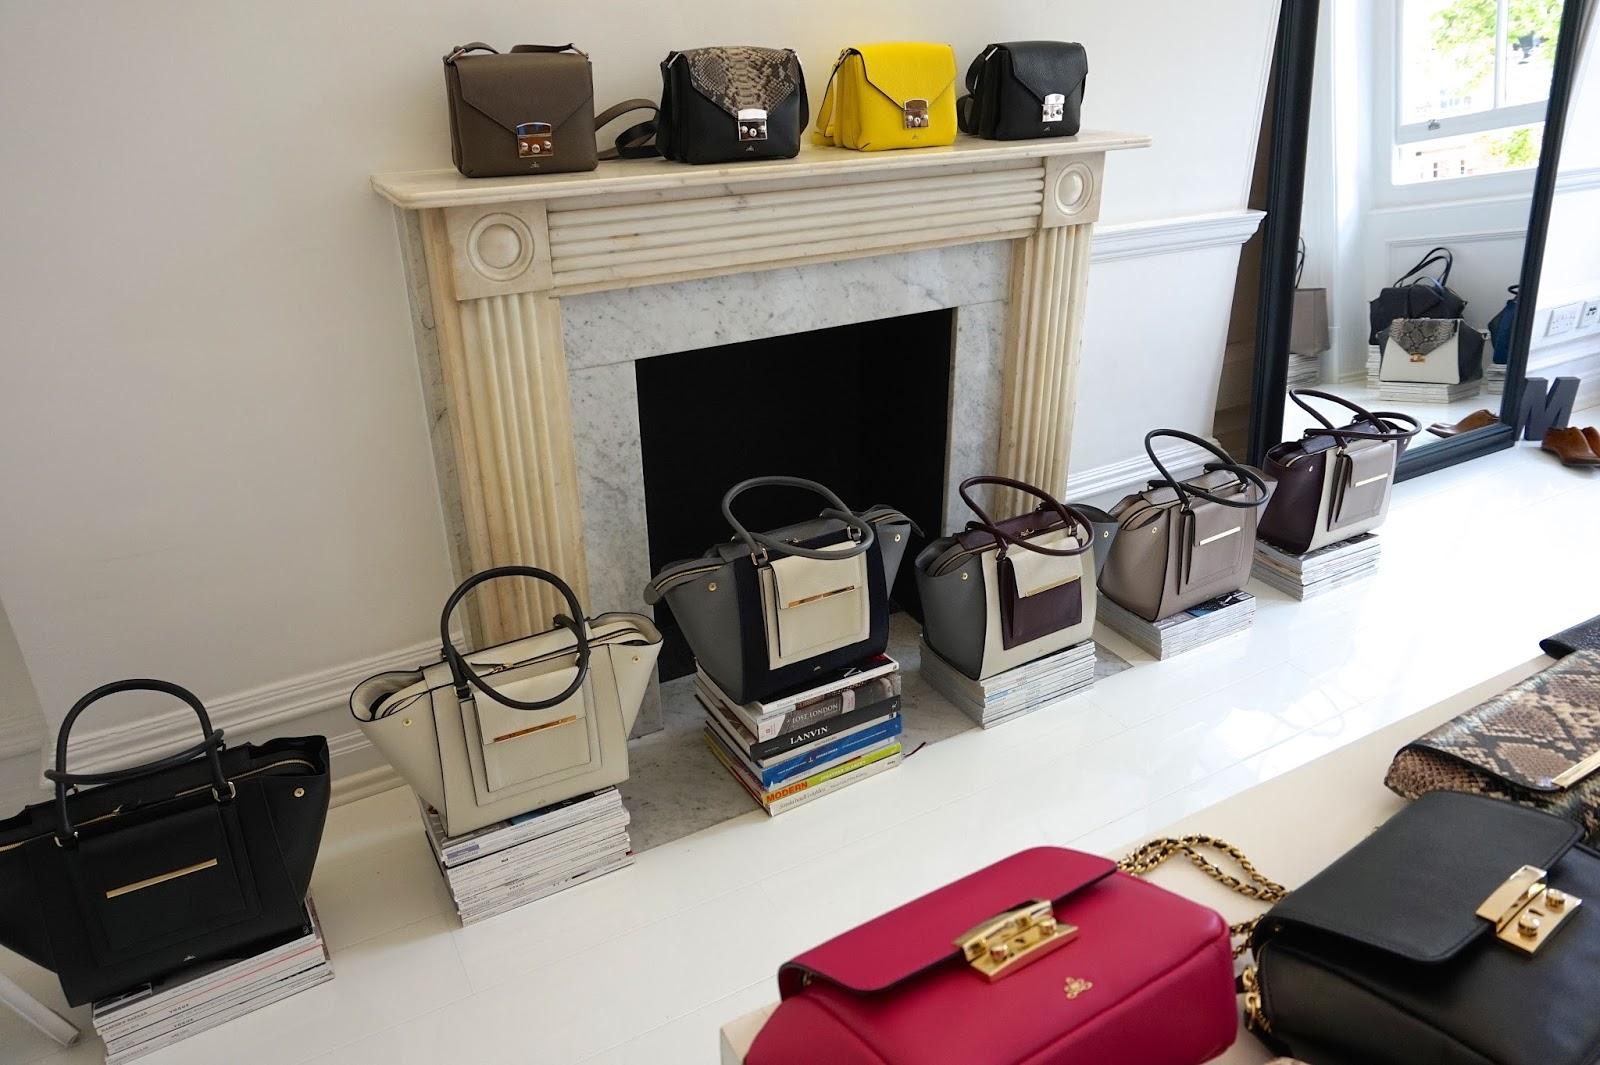 milli millu handbags event london